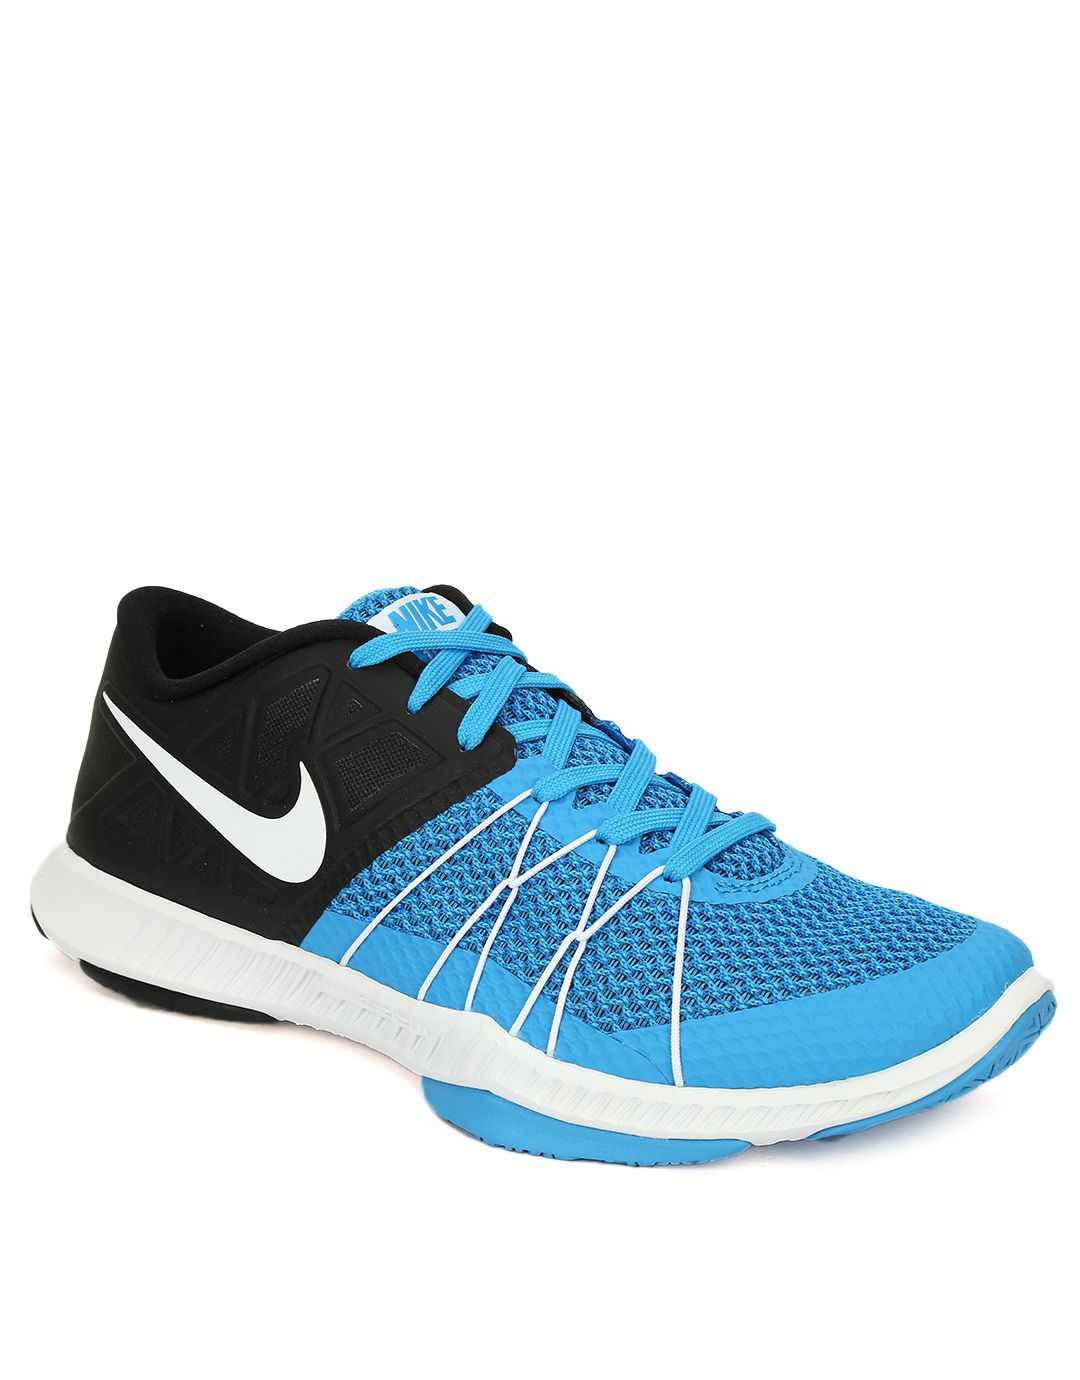 Nike Zoom Train Incredibly Fast Blue